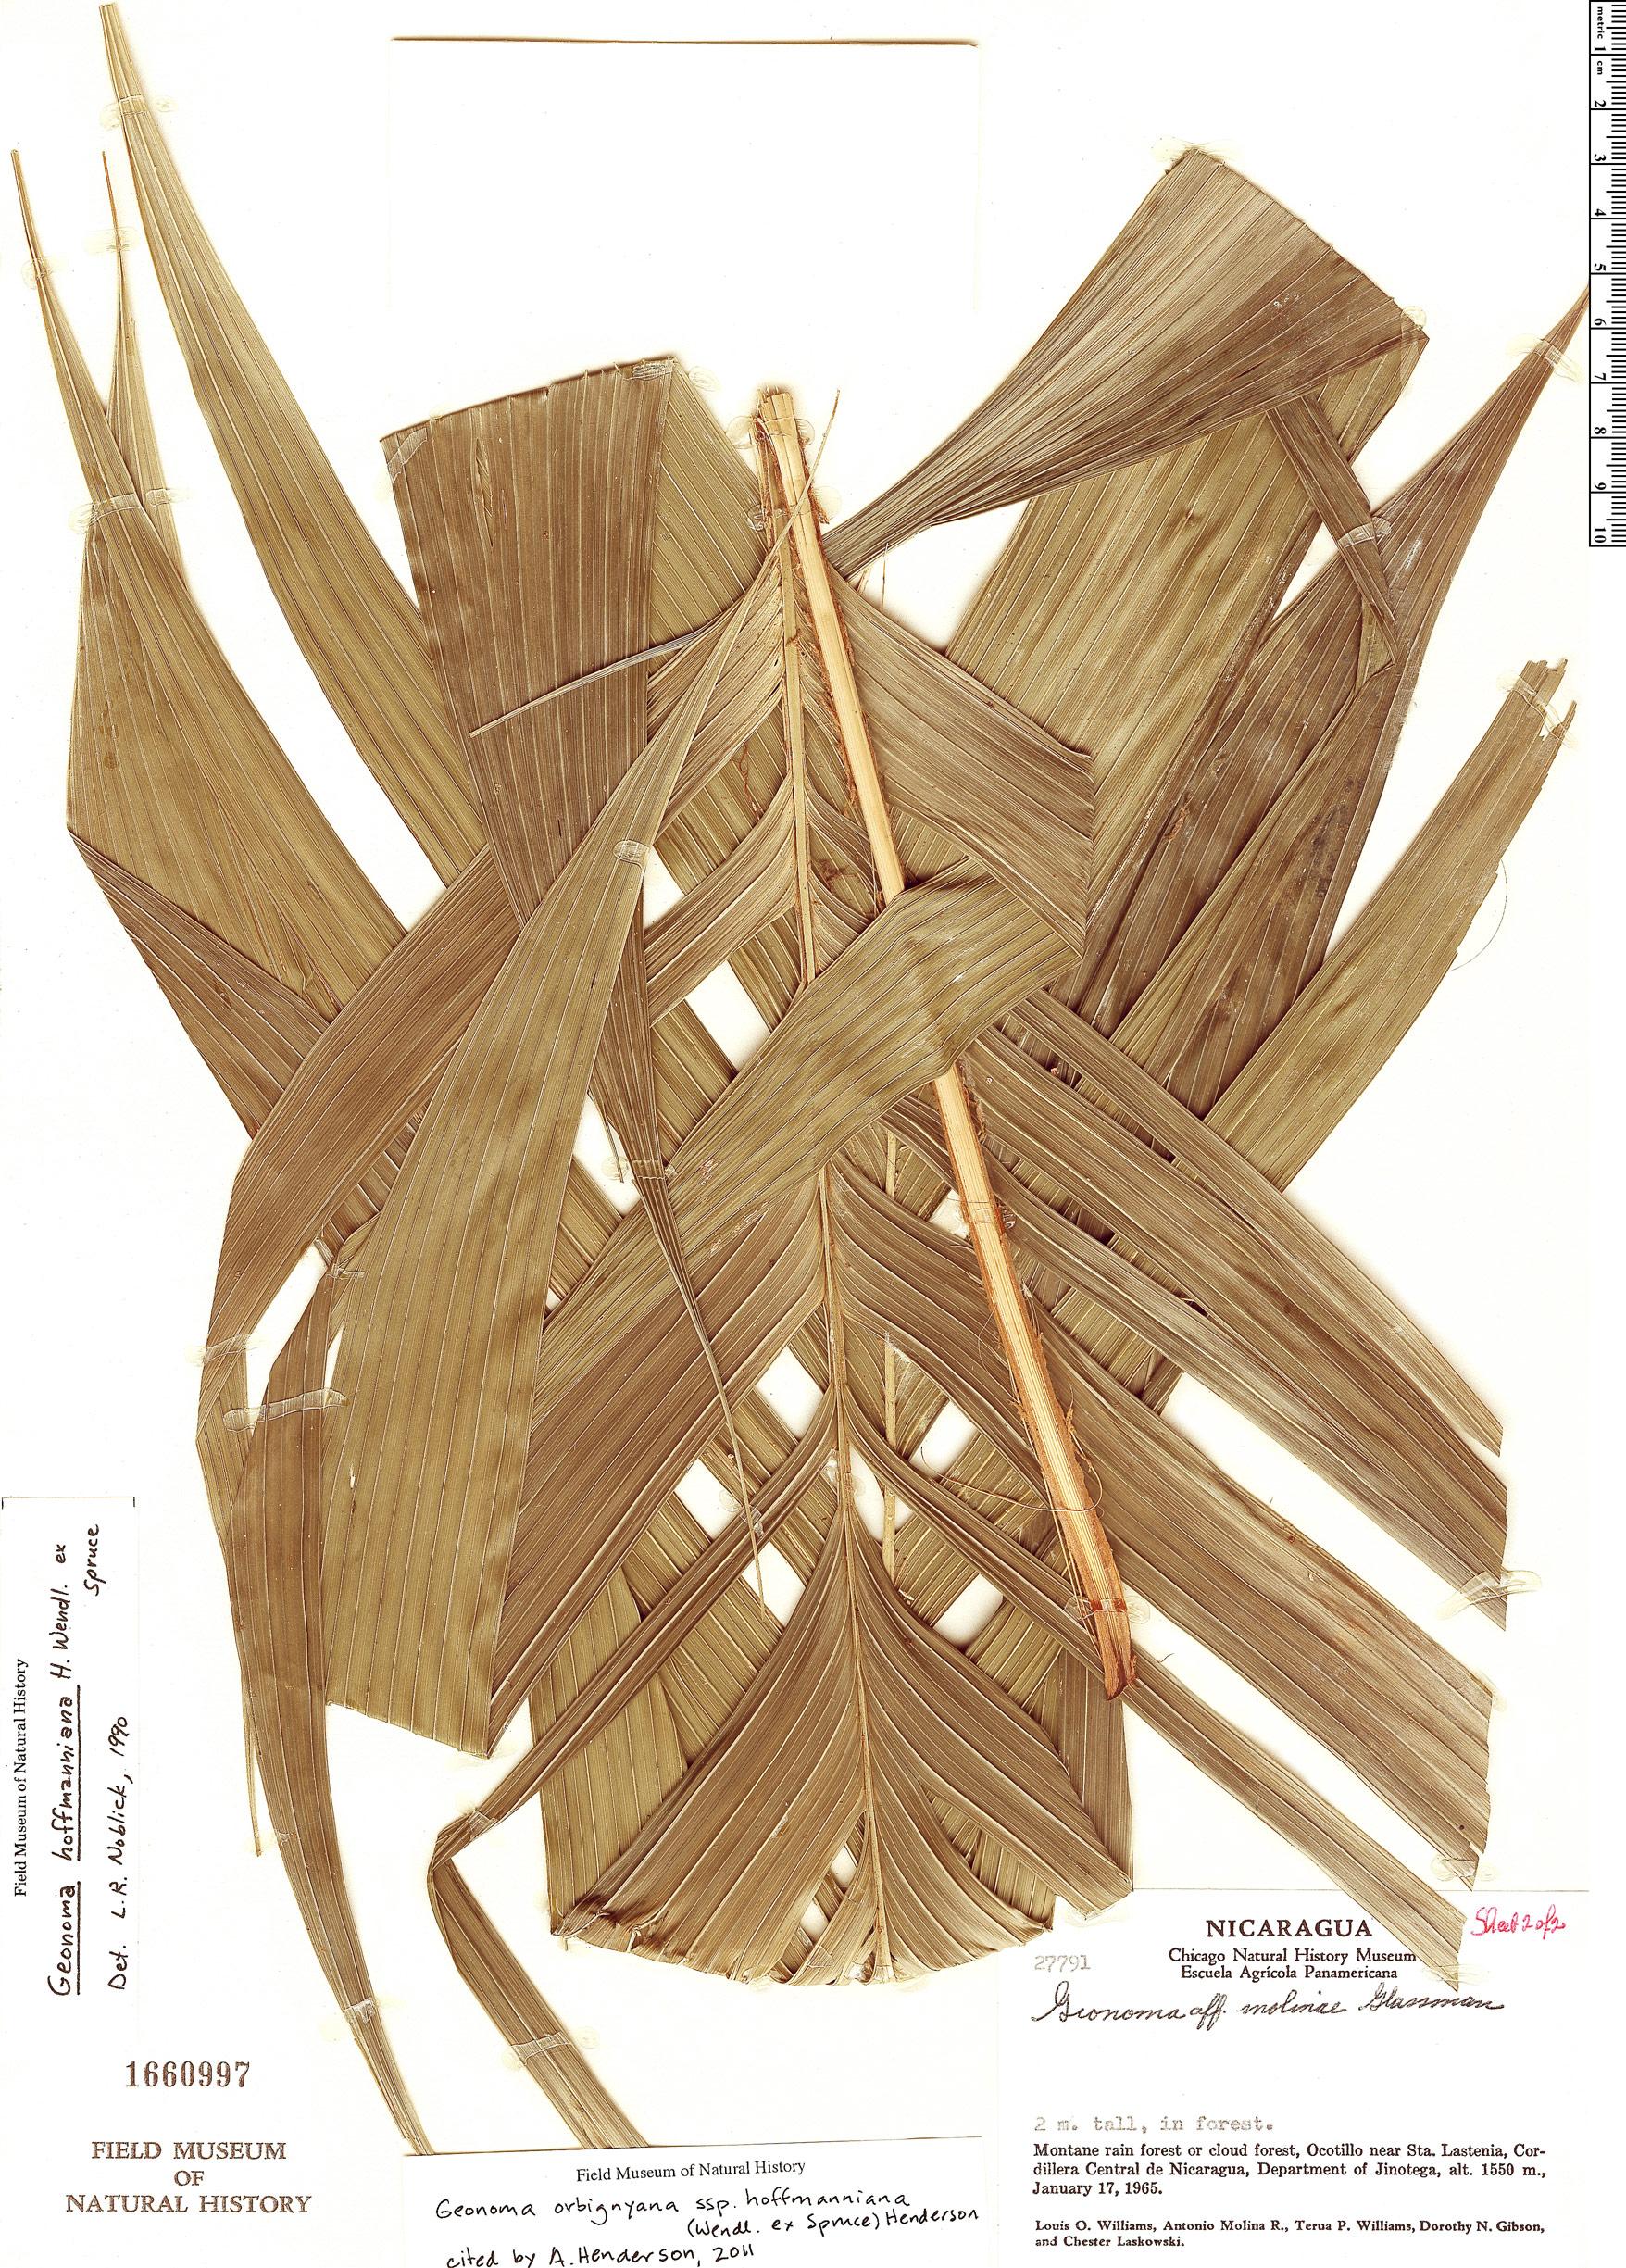 Espécime: Geonoma orbignyana